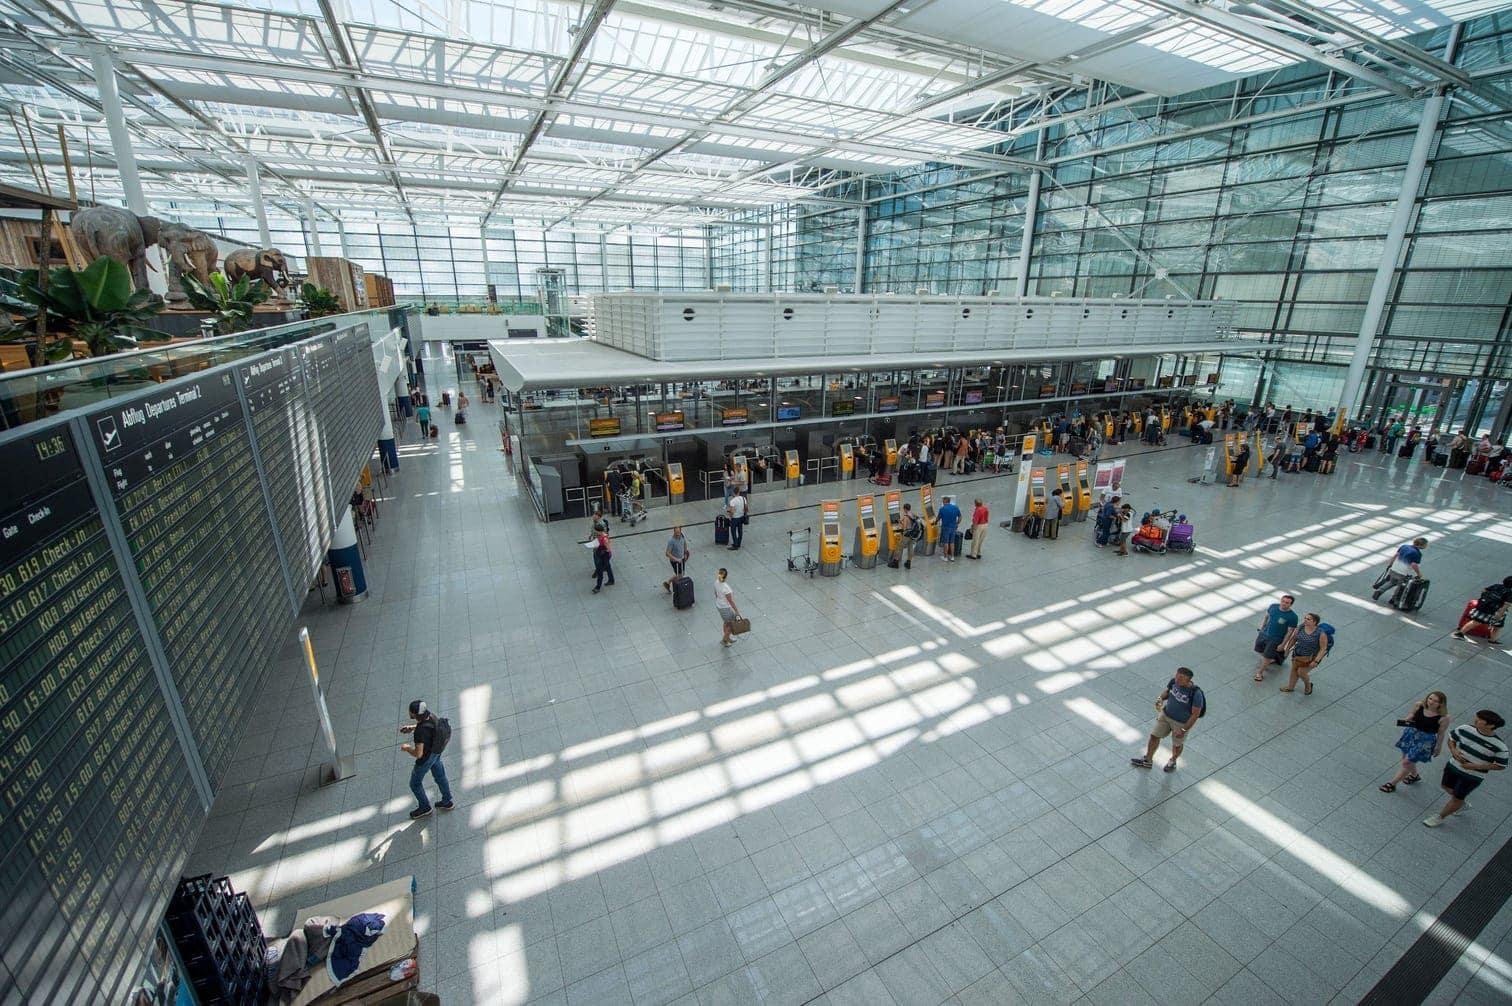 Www Flughafen Frankfurt De